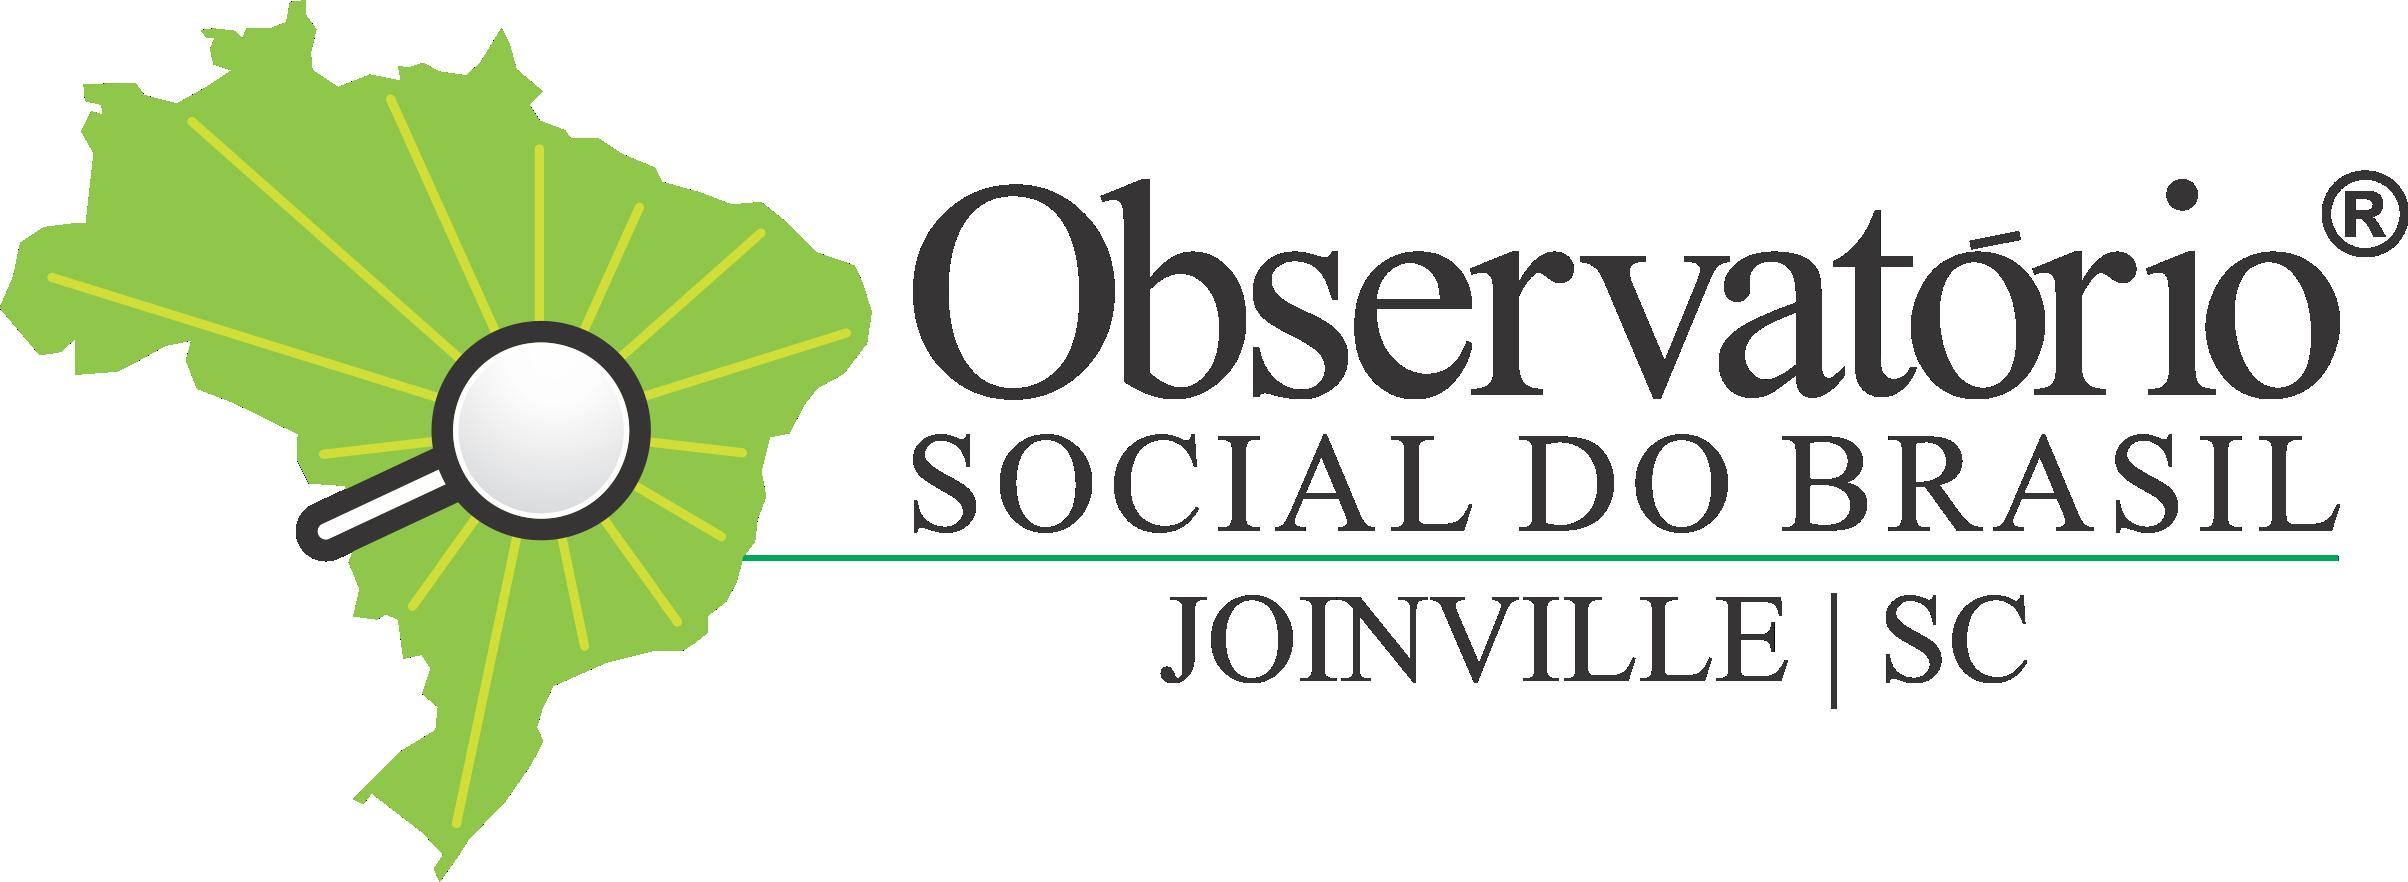 Observatório Social do Brasil - Joinville